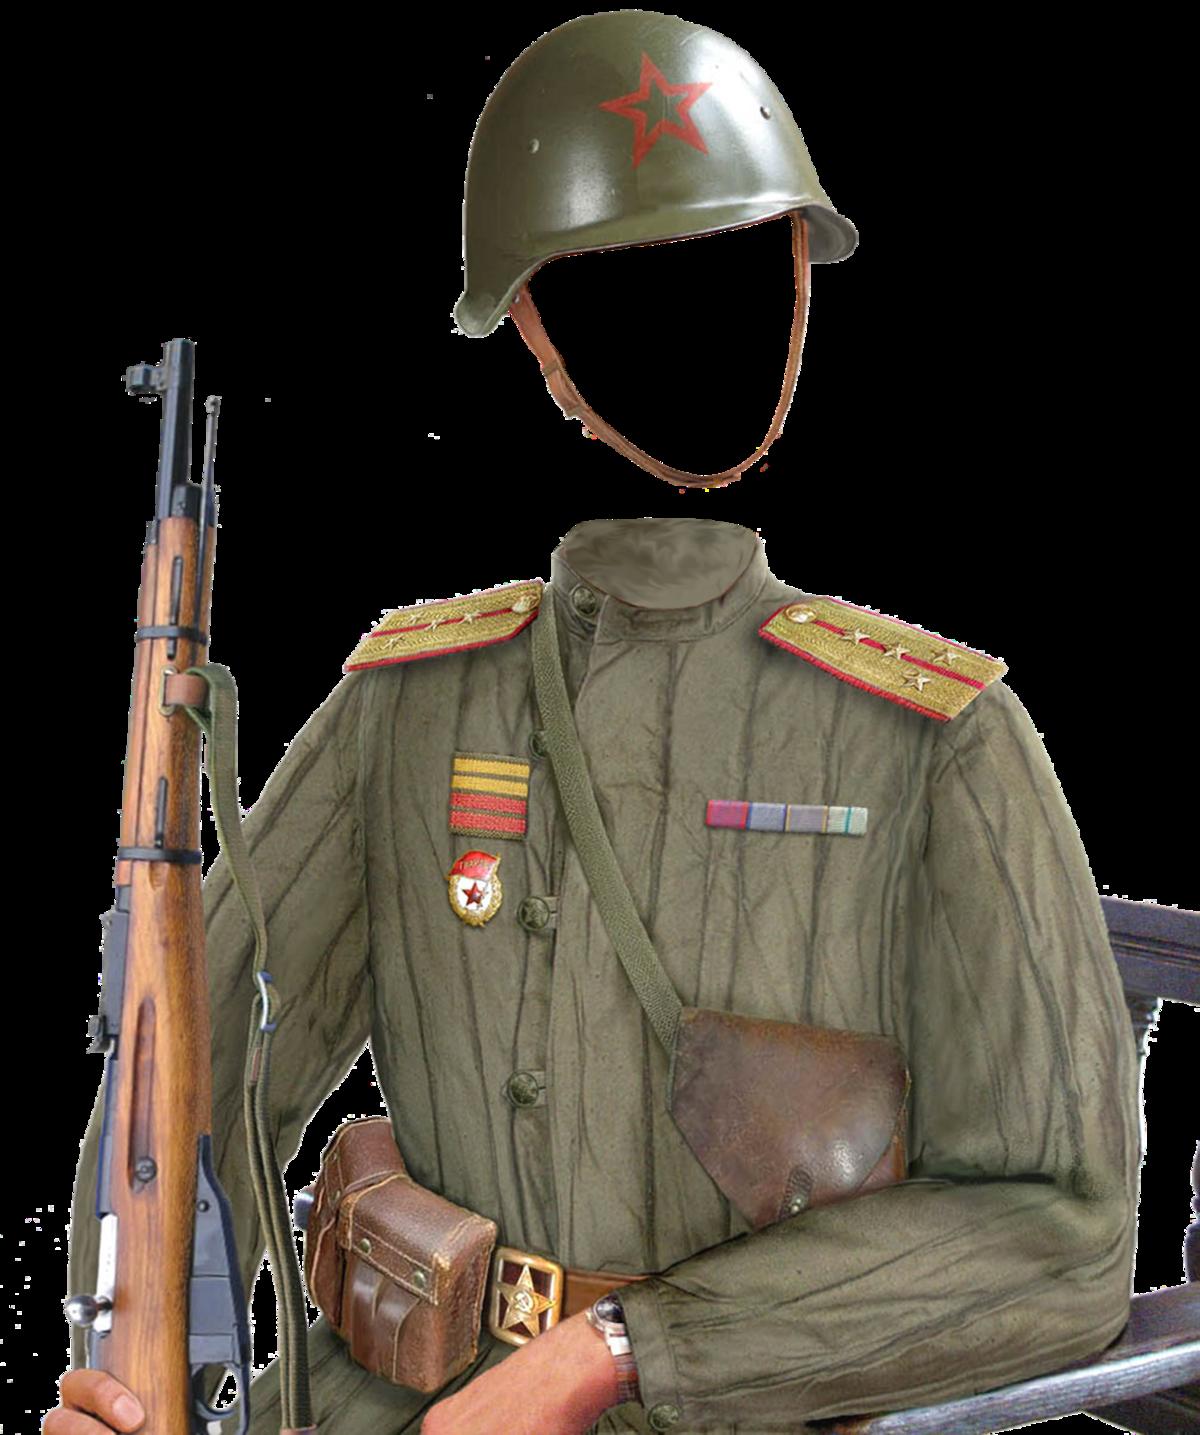 Стоматолог, картинка для коллажа тело солдата без головы